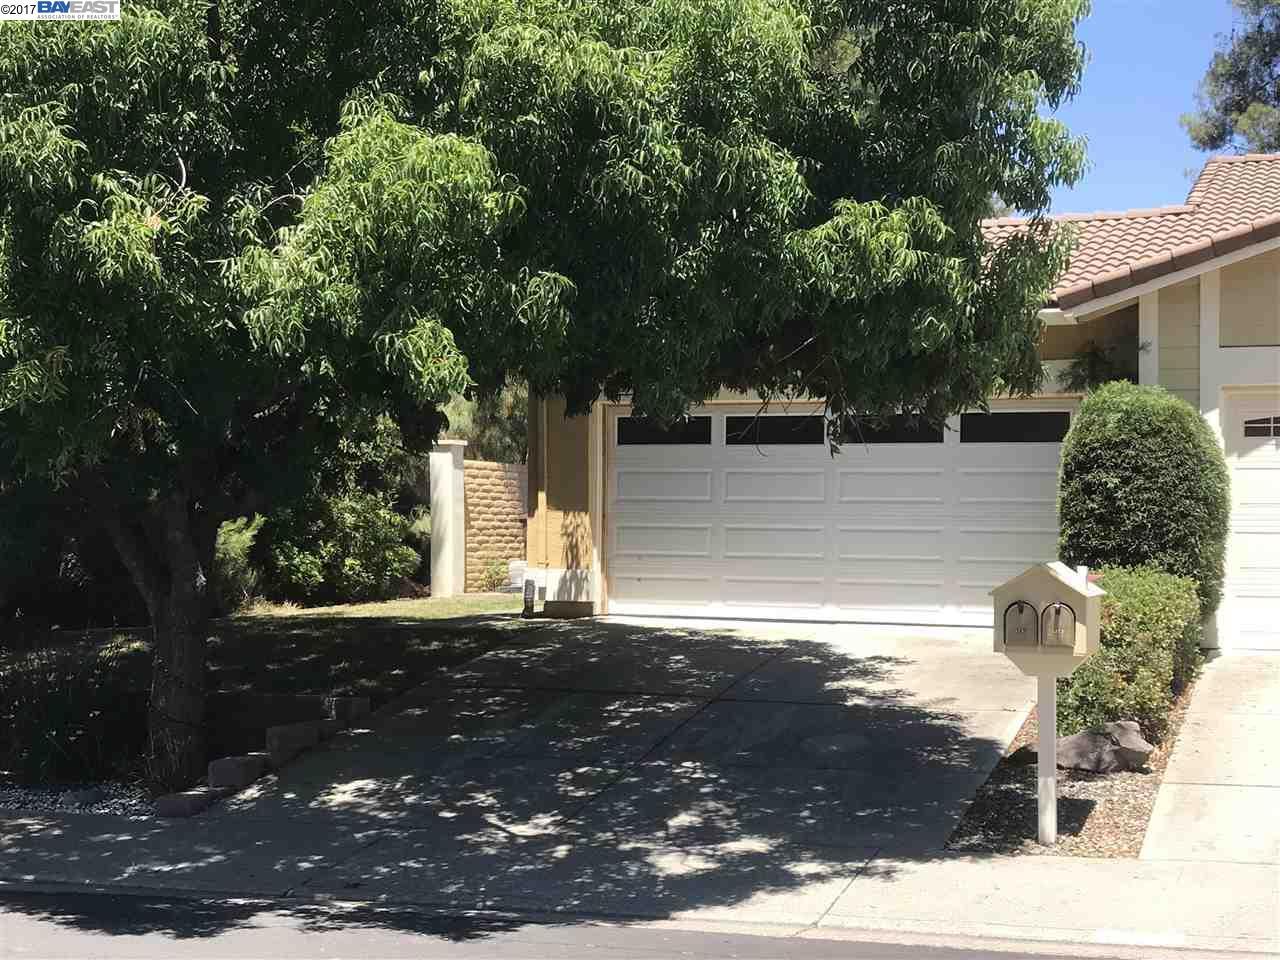 5251 Grasswood Ct, CONCORD, CA 94521